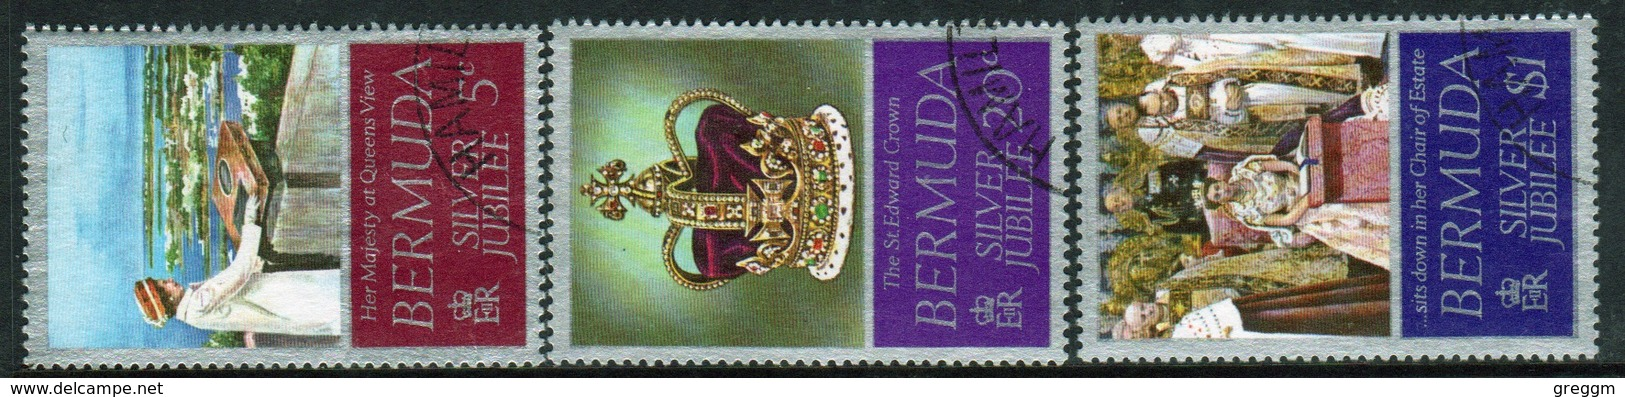 Bermuda Elizabeth II 1977 Set Of Stamps To Celebrate The Silver Jubilee. - Bermuda